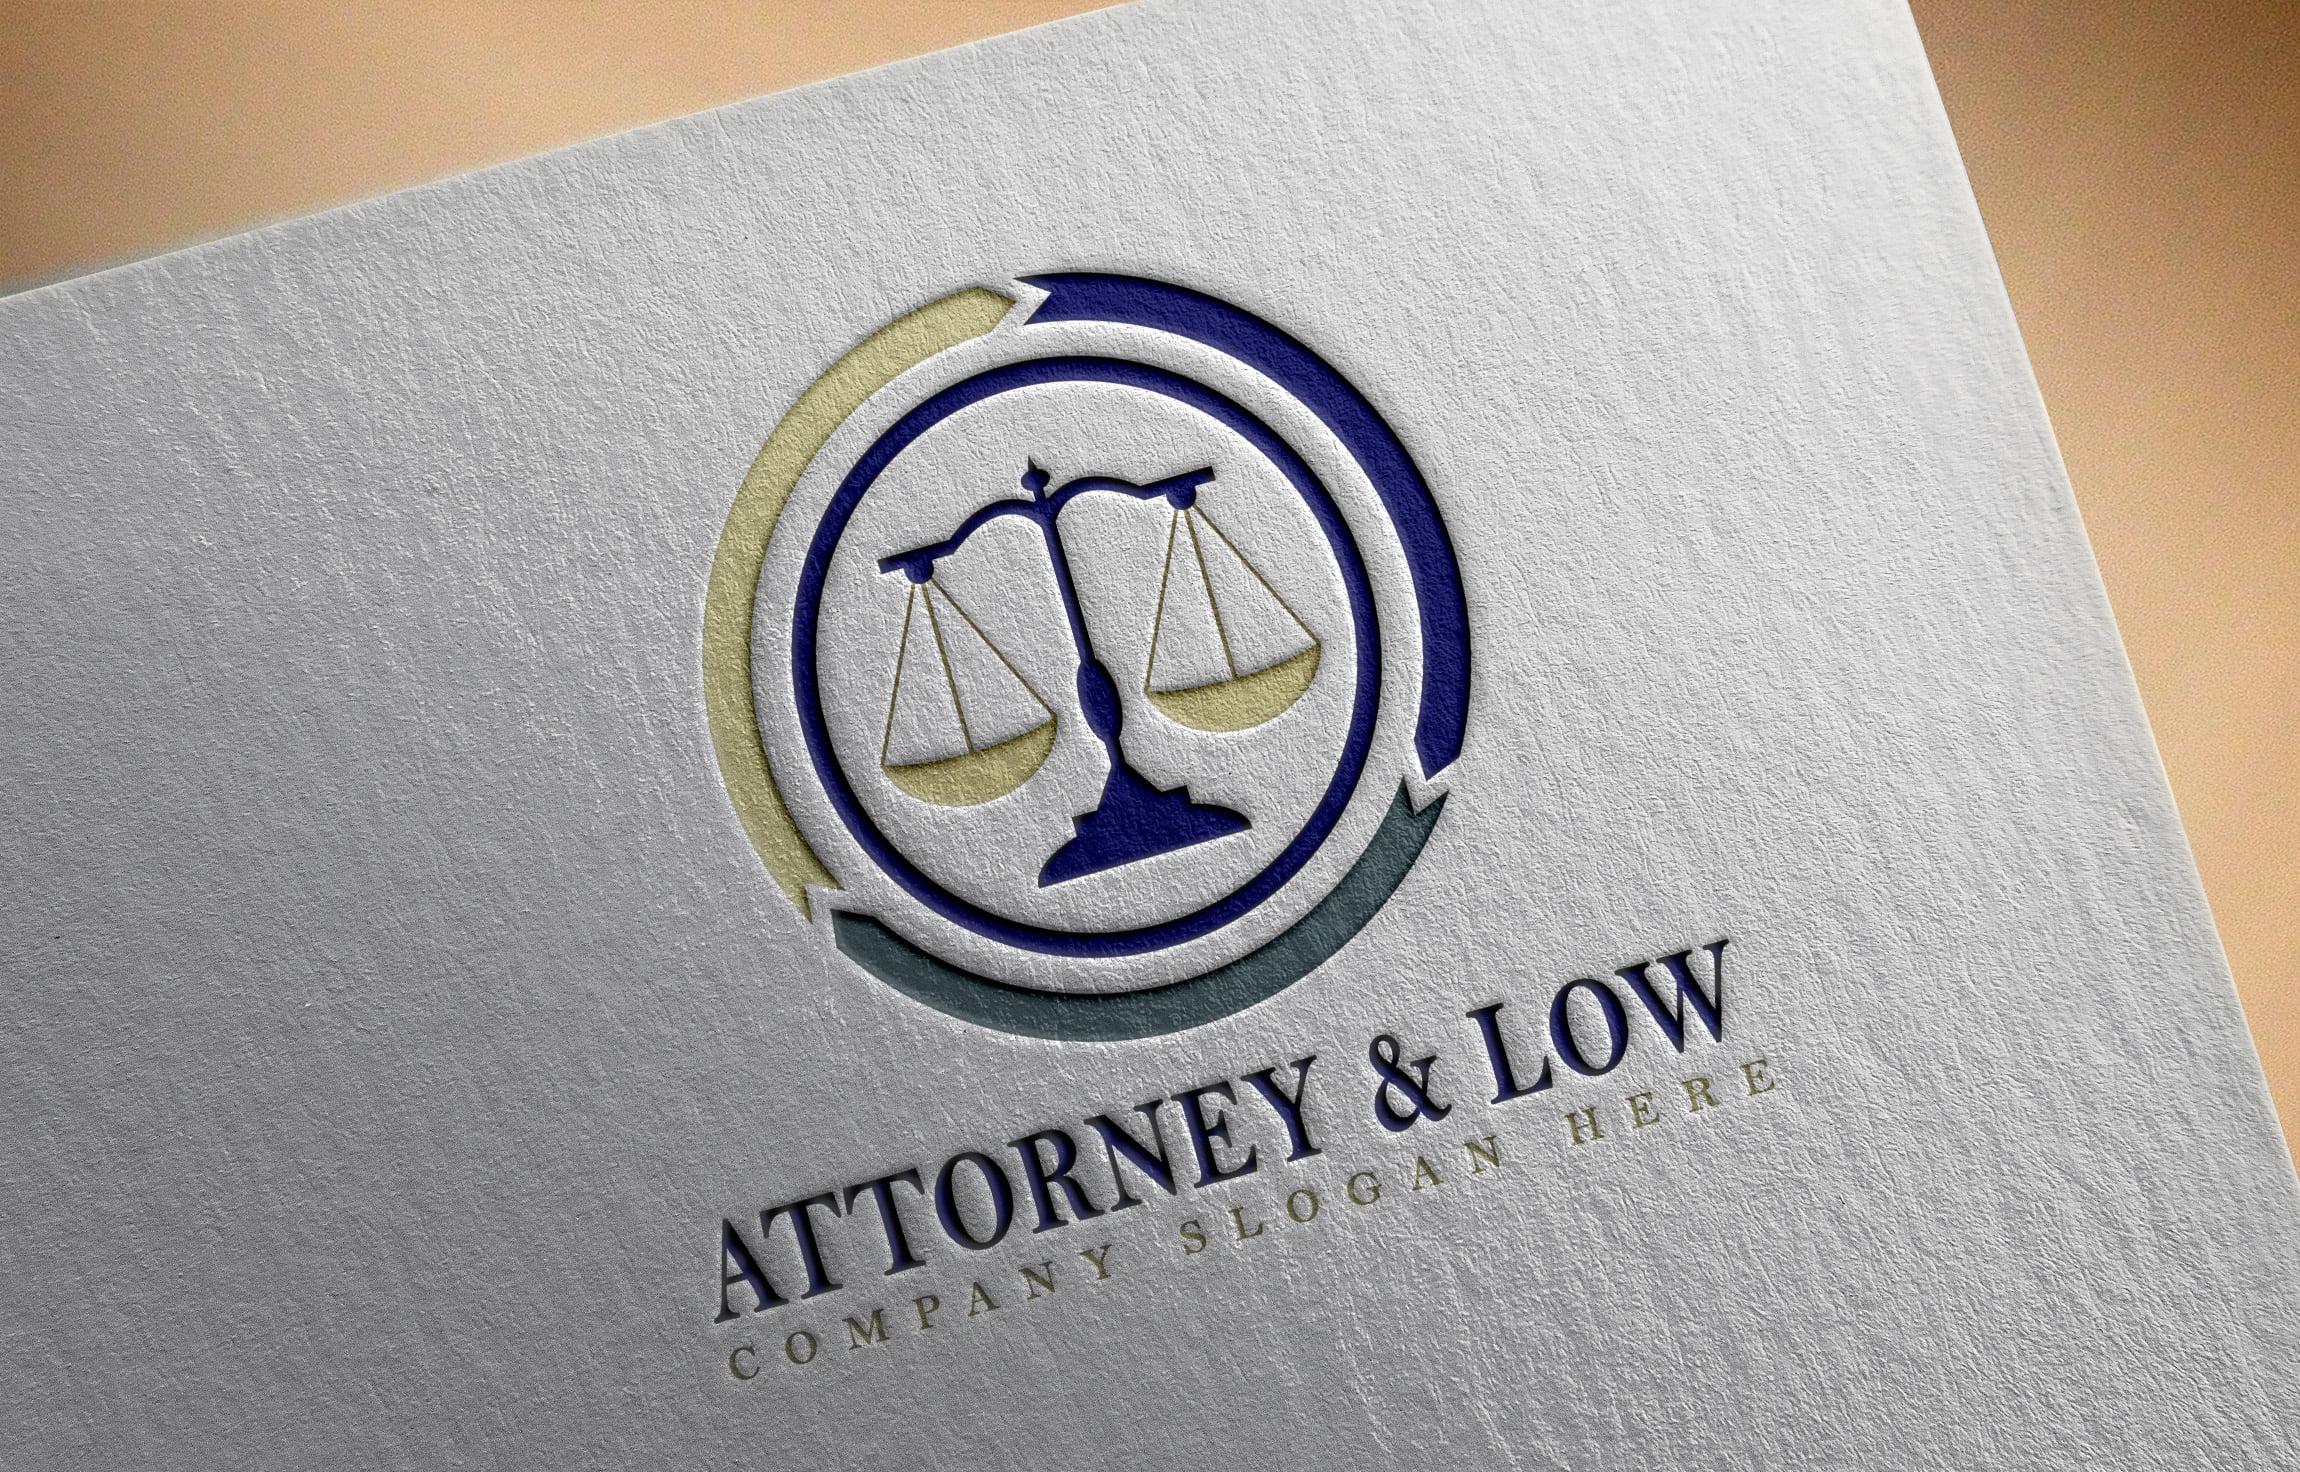 Attorney & Law logo design on paper mockup